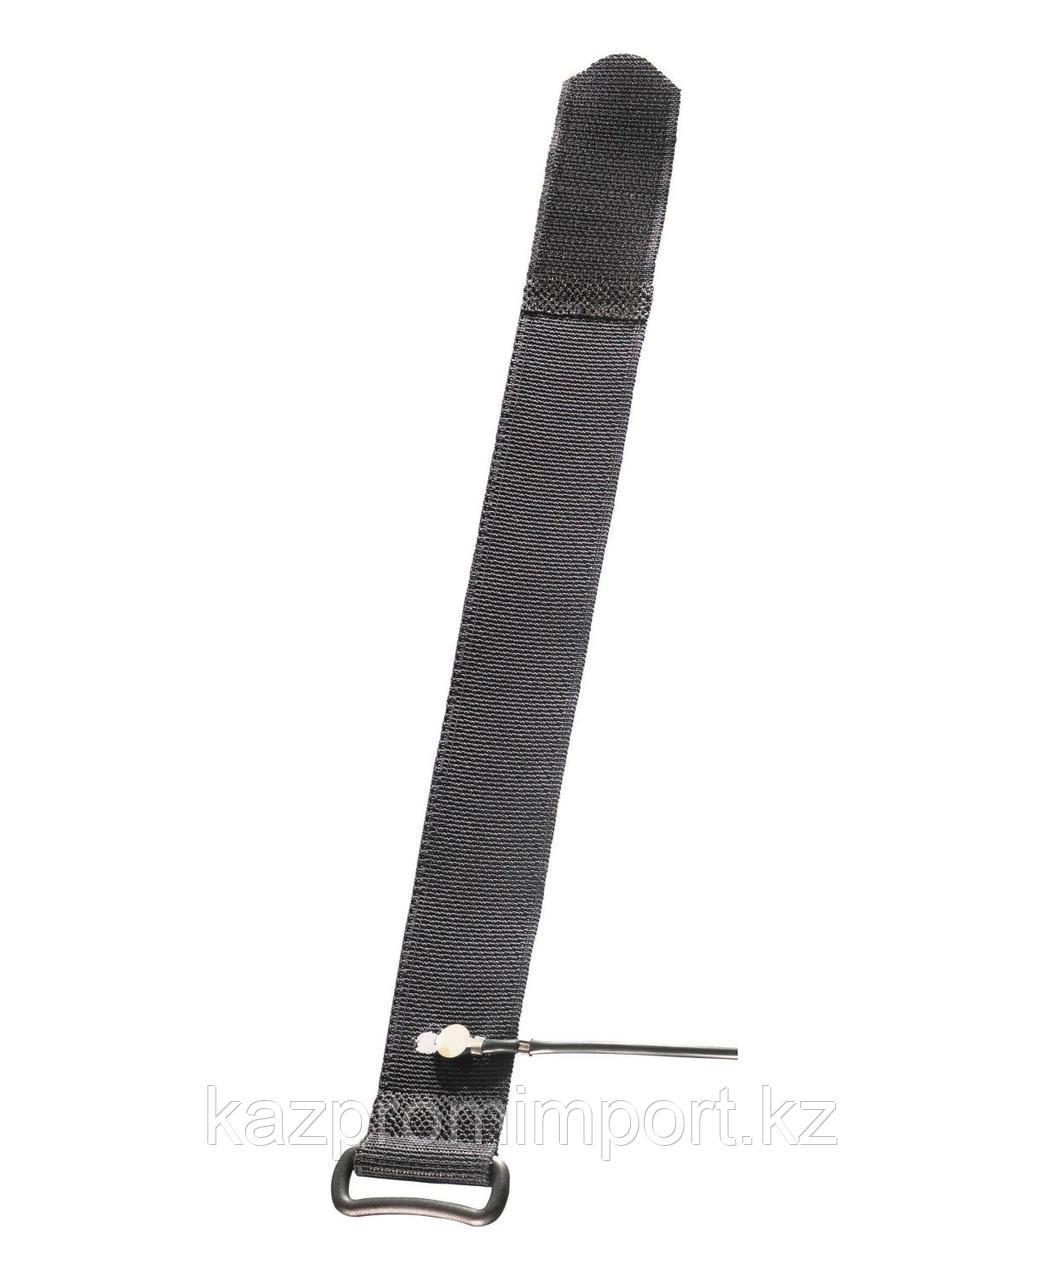 Зонд-обкрутка для труб диаметром до 75 мм, с липучкой Velcro